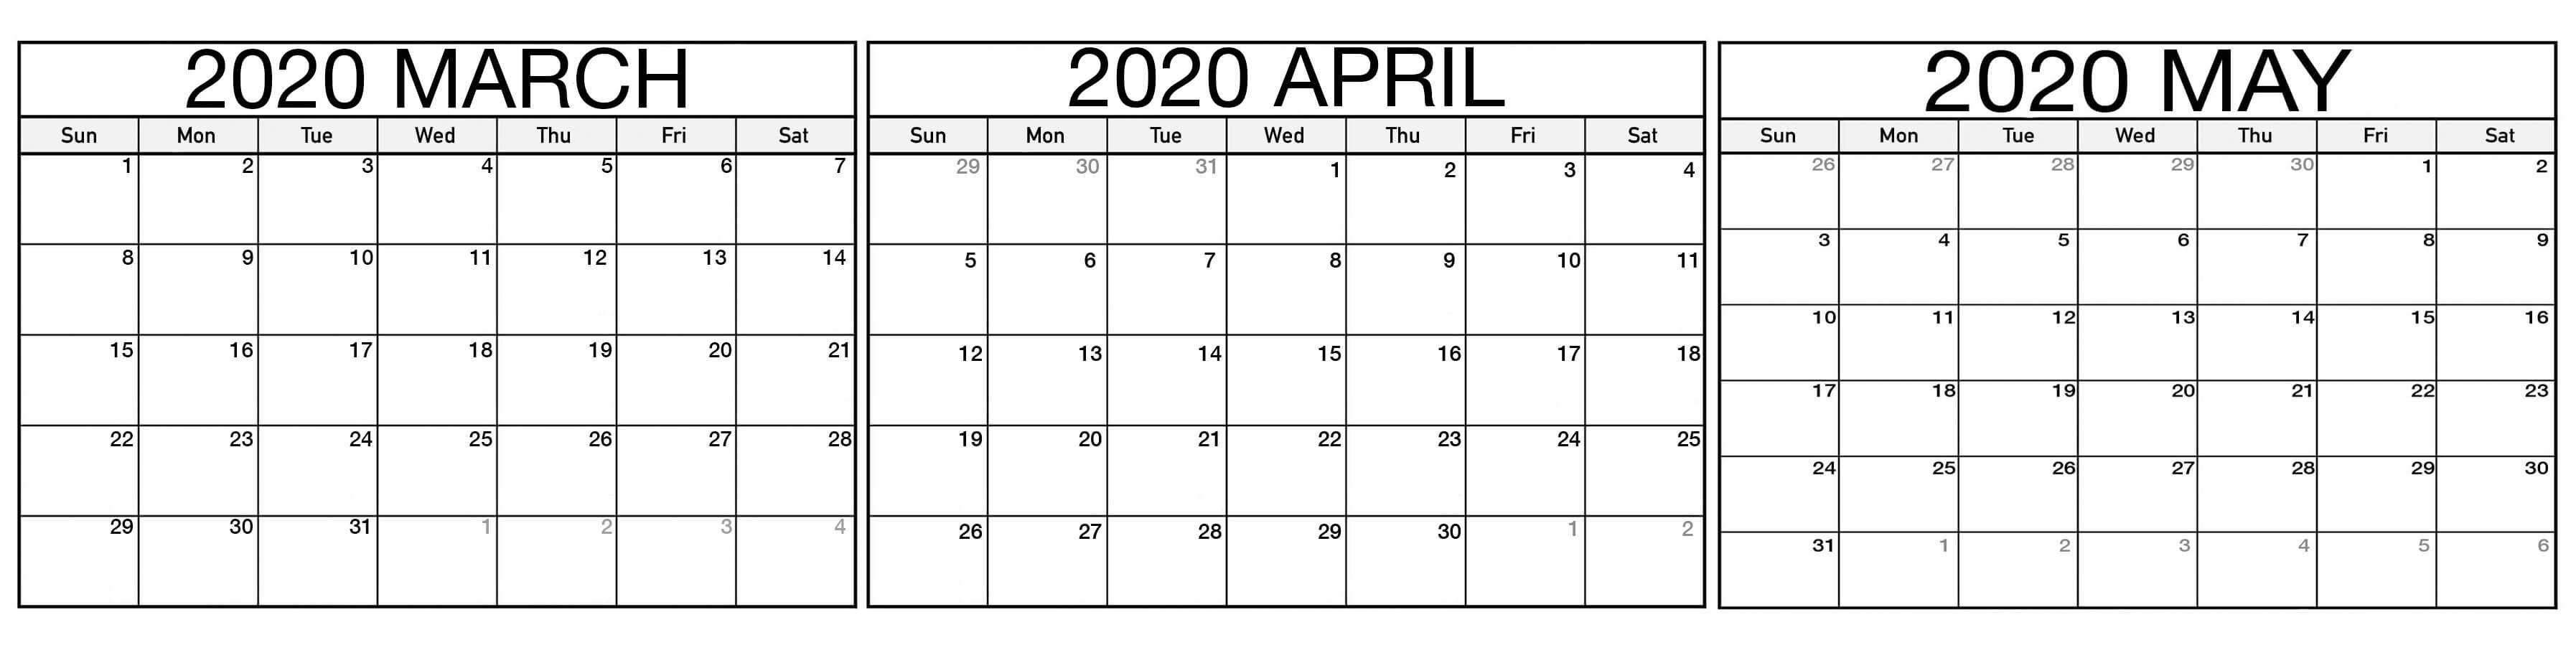 March April May 2020 Calendar Printable - Free Calendars